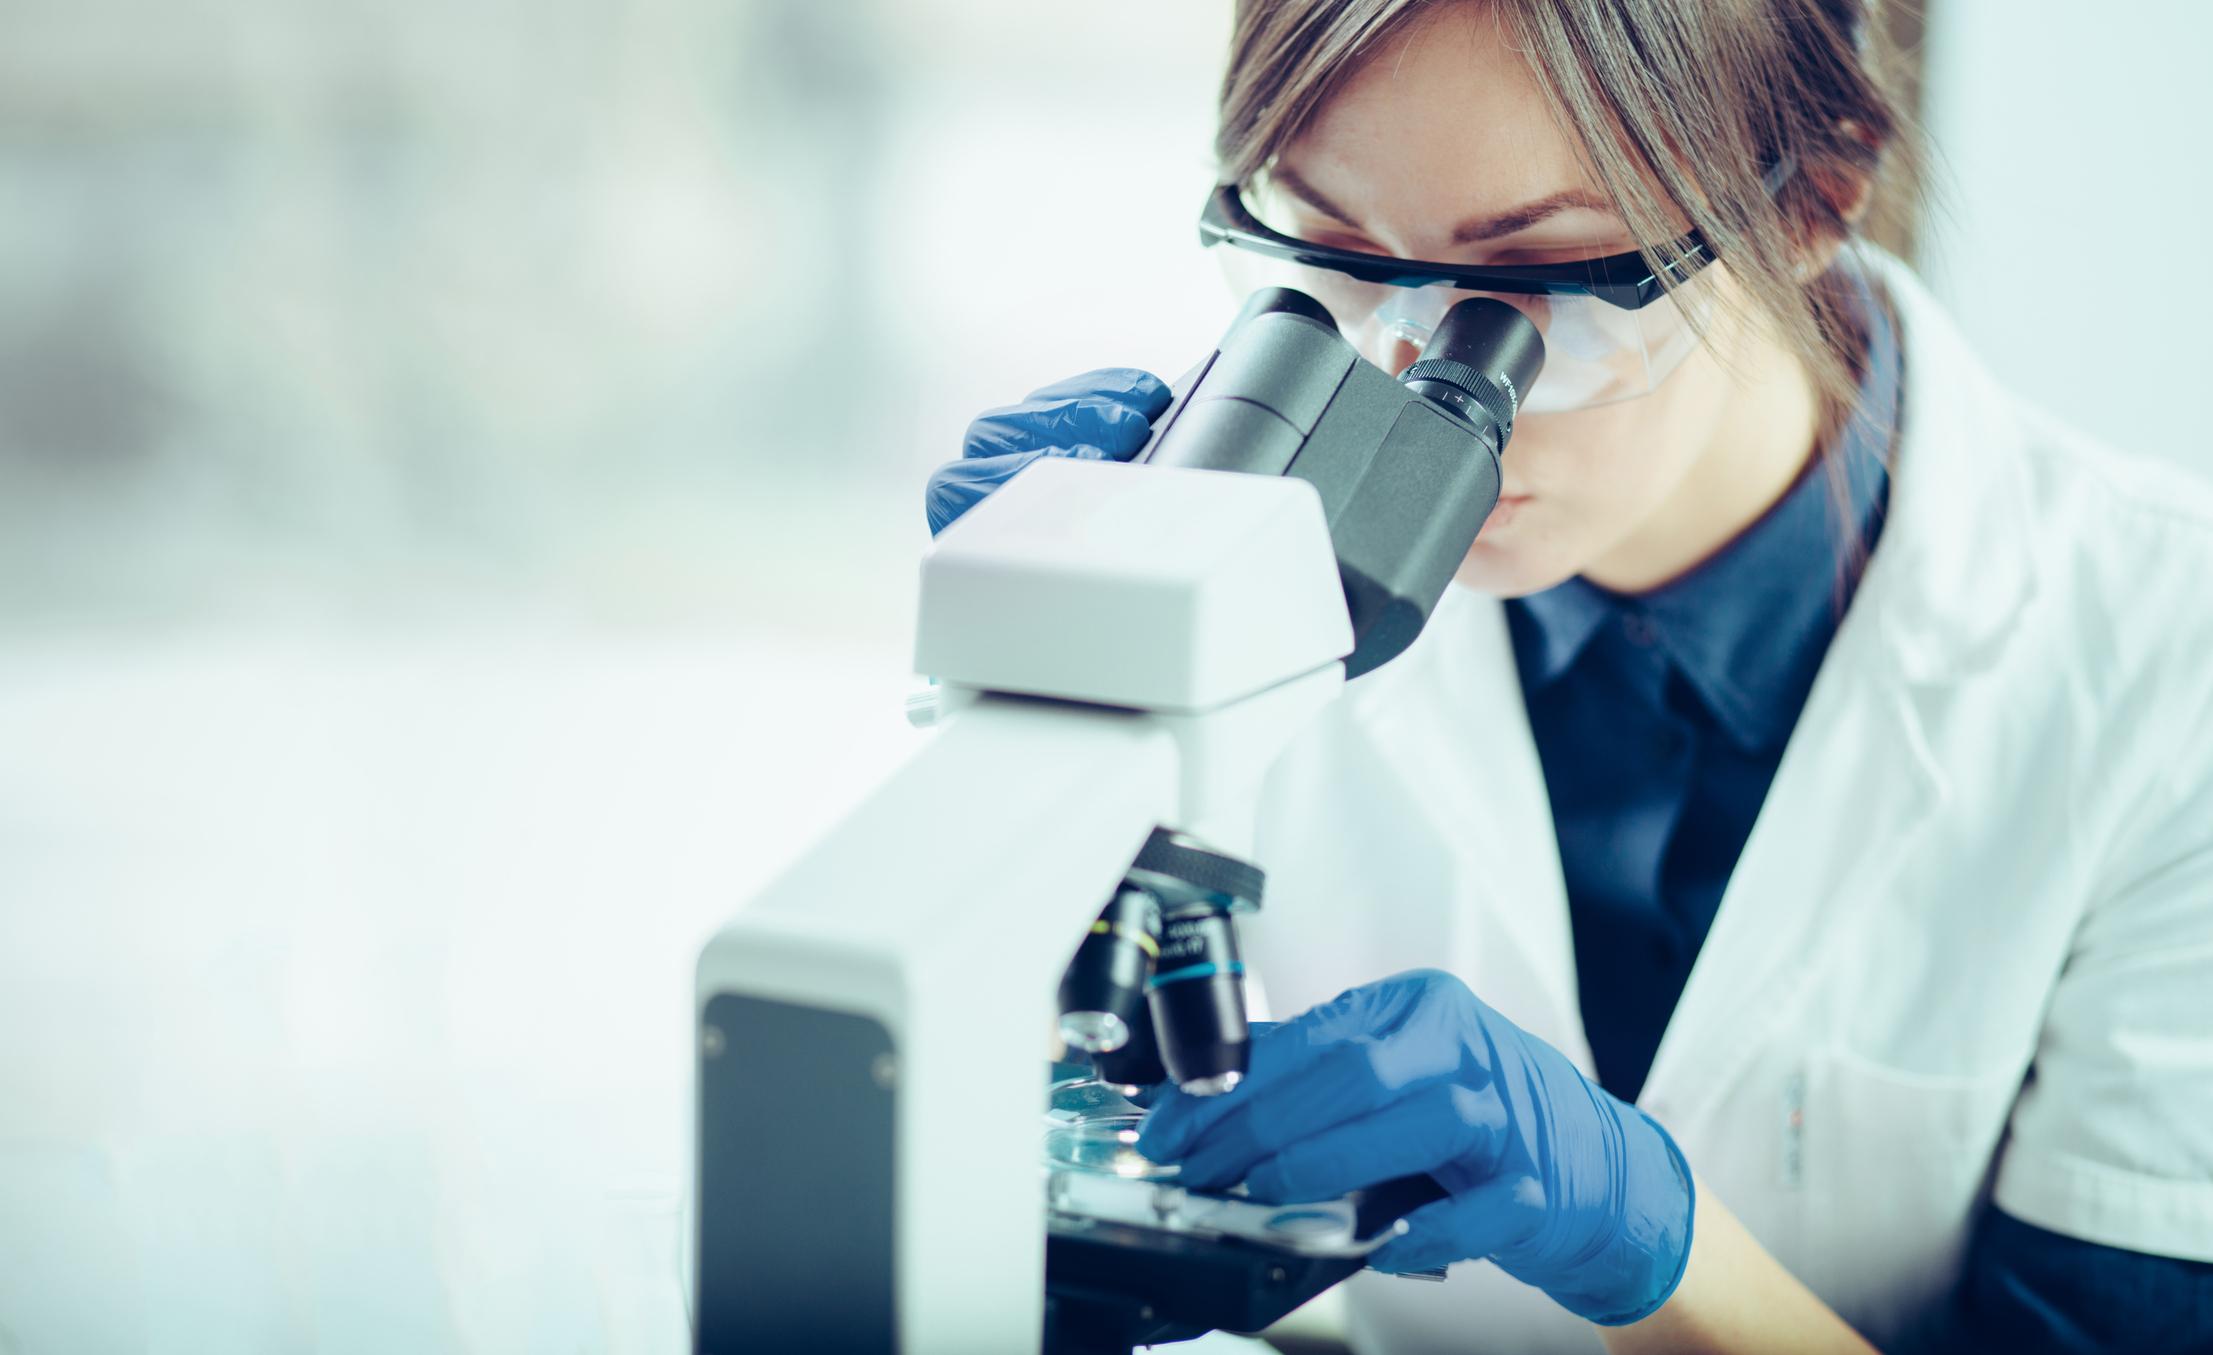 Female scientist in lab coat looking through microscope